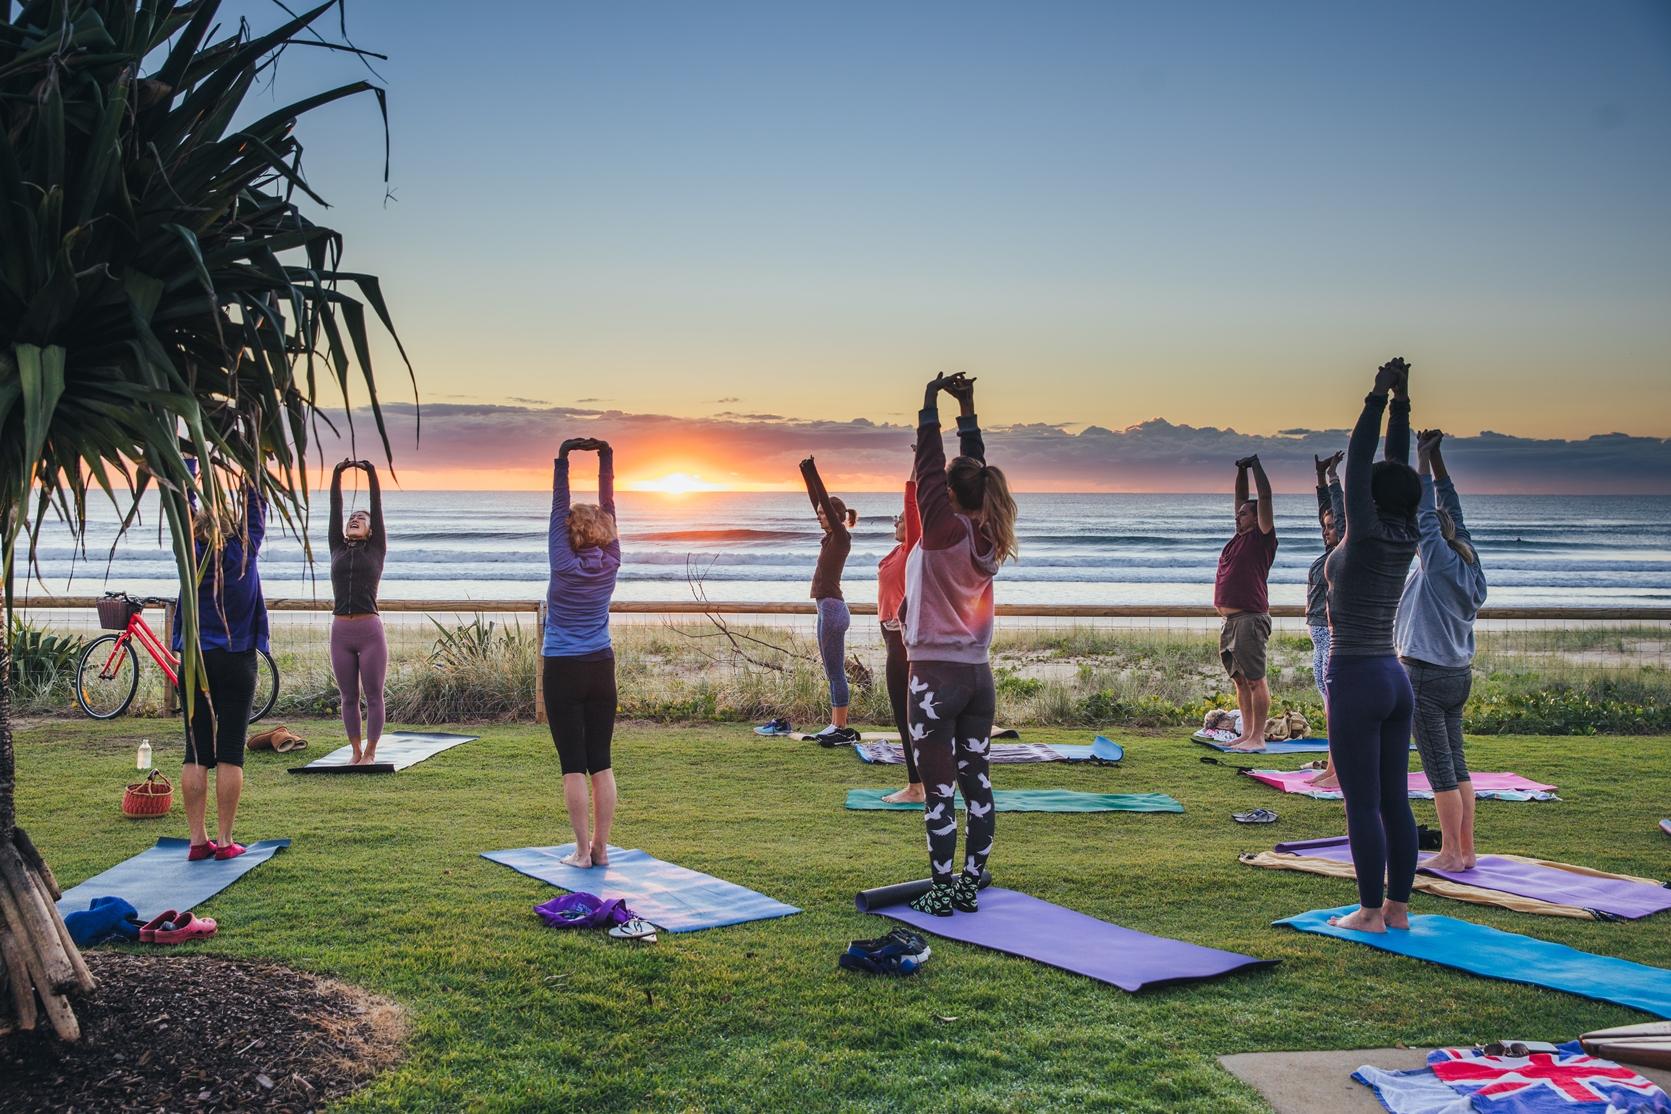 Yoga at sunrise by a beach